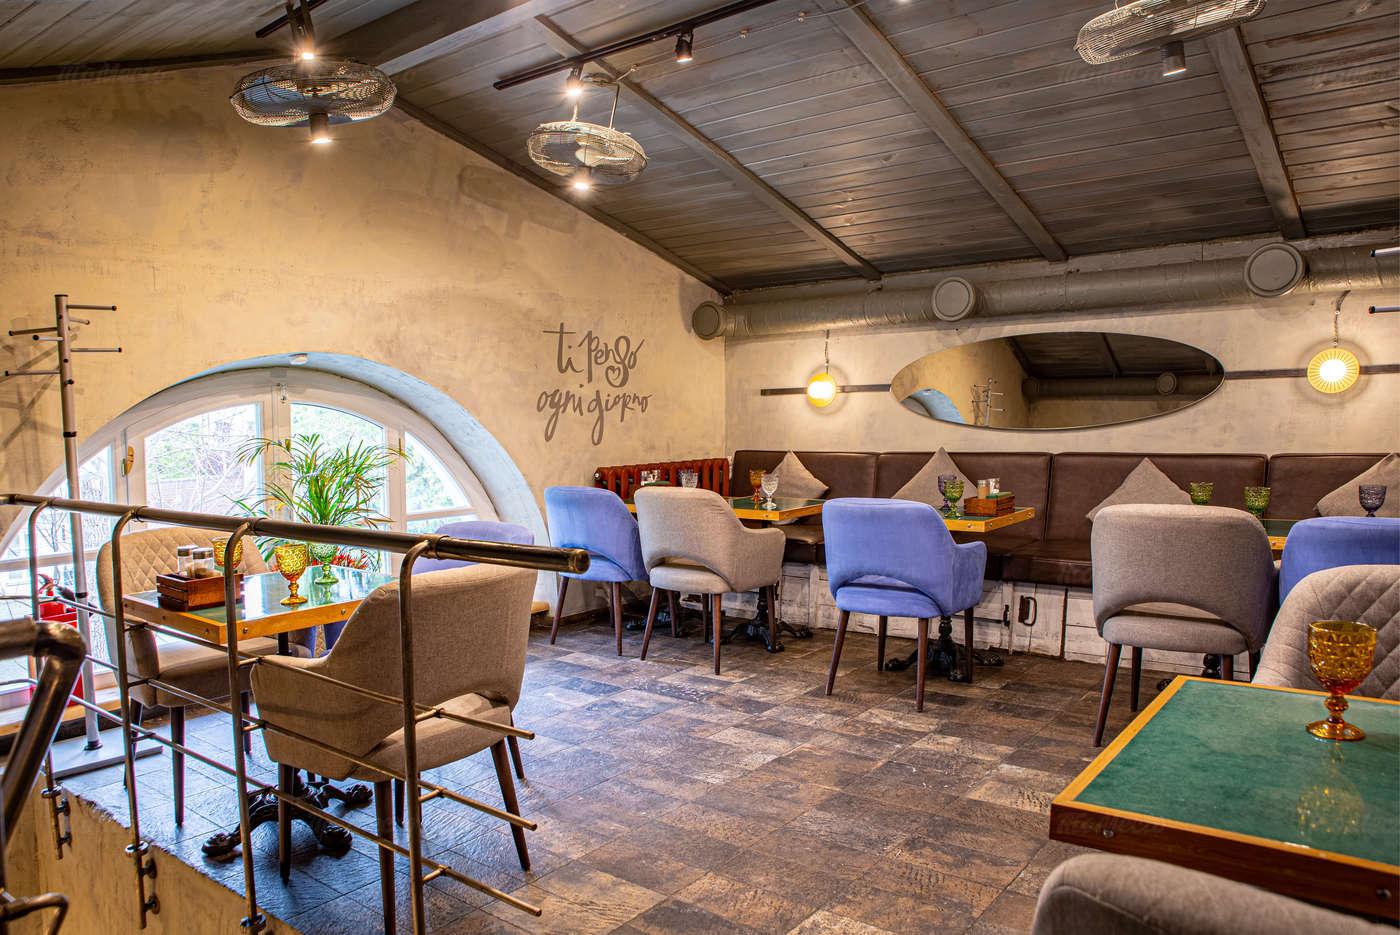 Ресторан IL LETTERATO (Литератор) в Петроверигском переулке фото 32